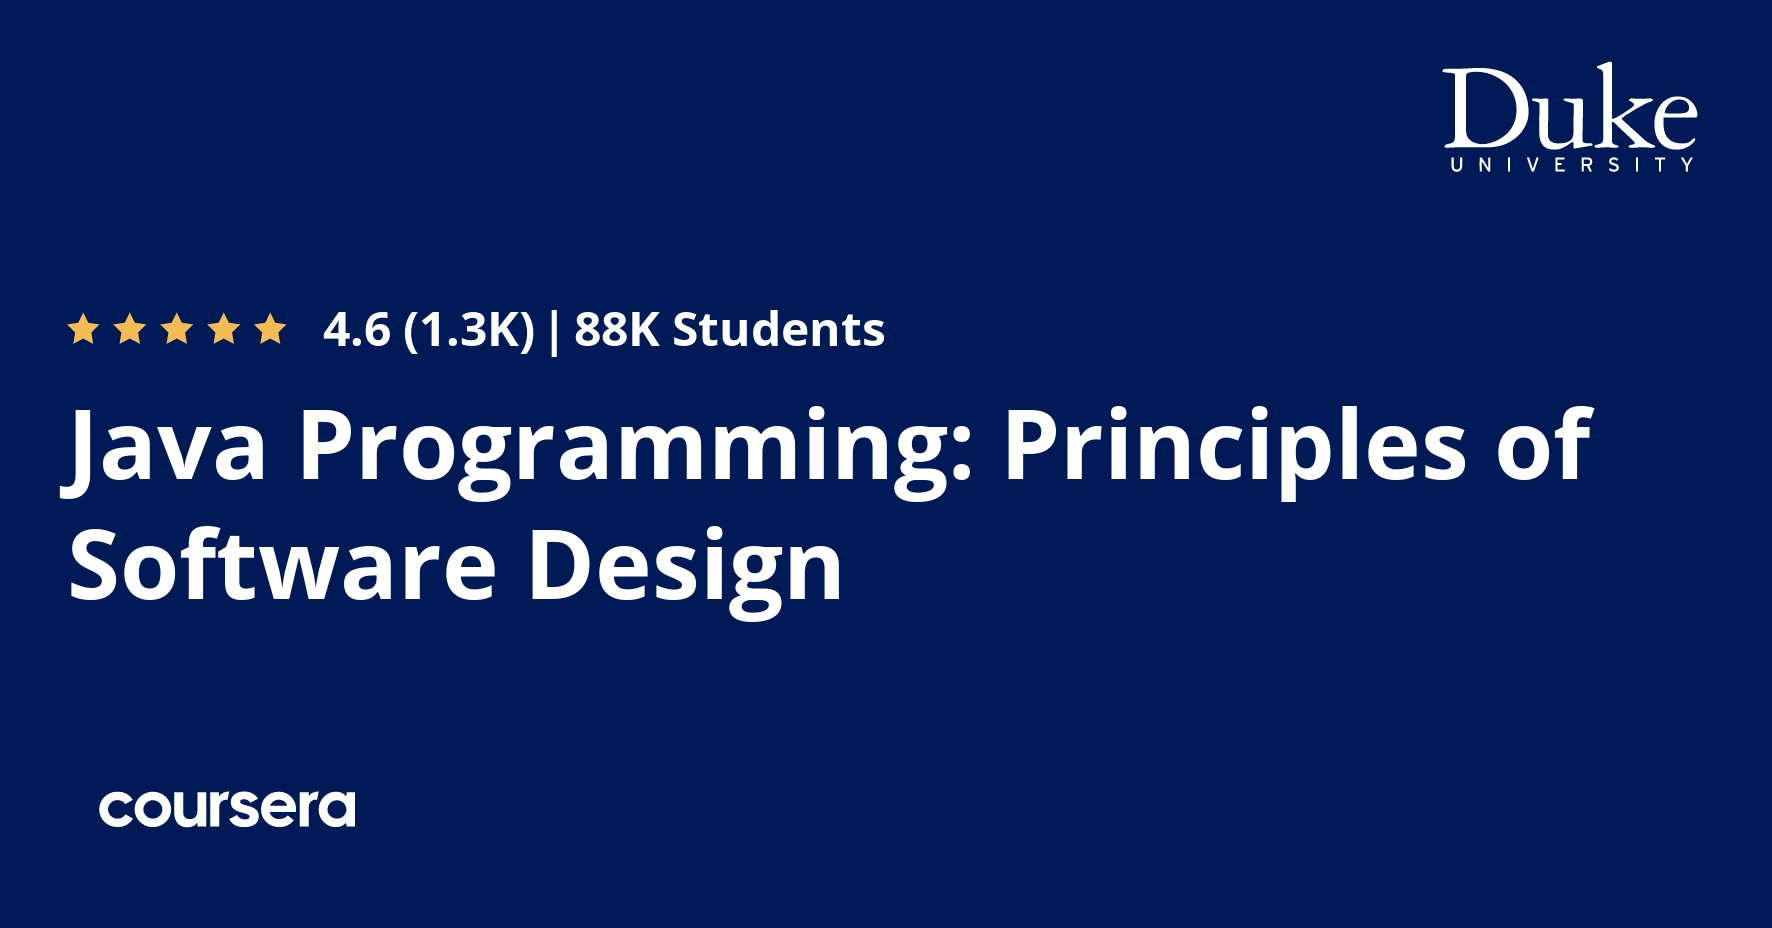 Java Programming: Principles of Software Design